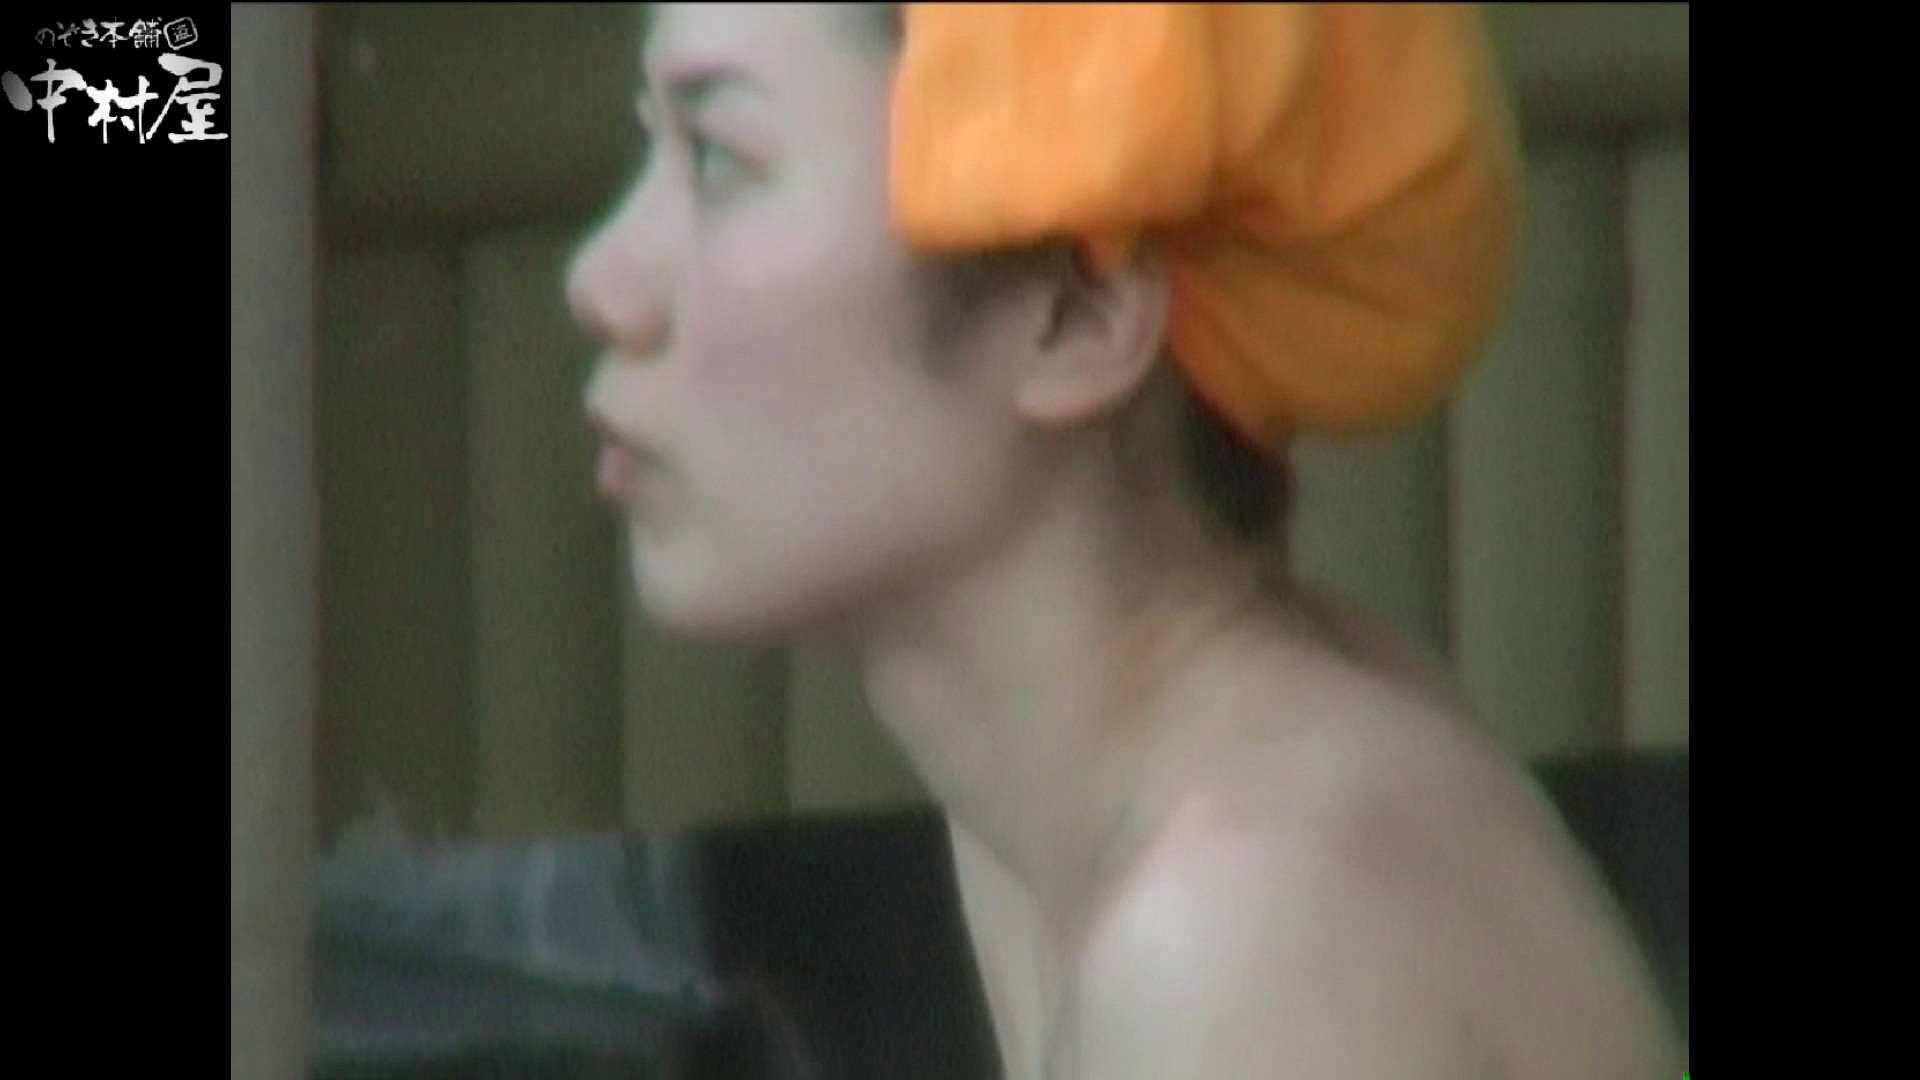 Aquaな露天風呂Vol.978 OL女体  88連発 60